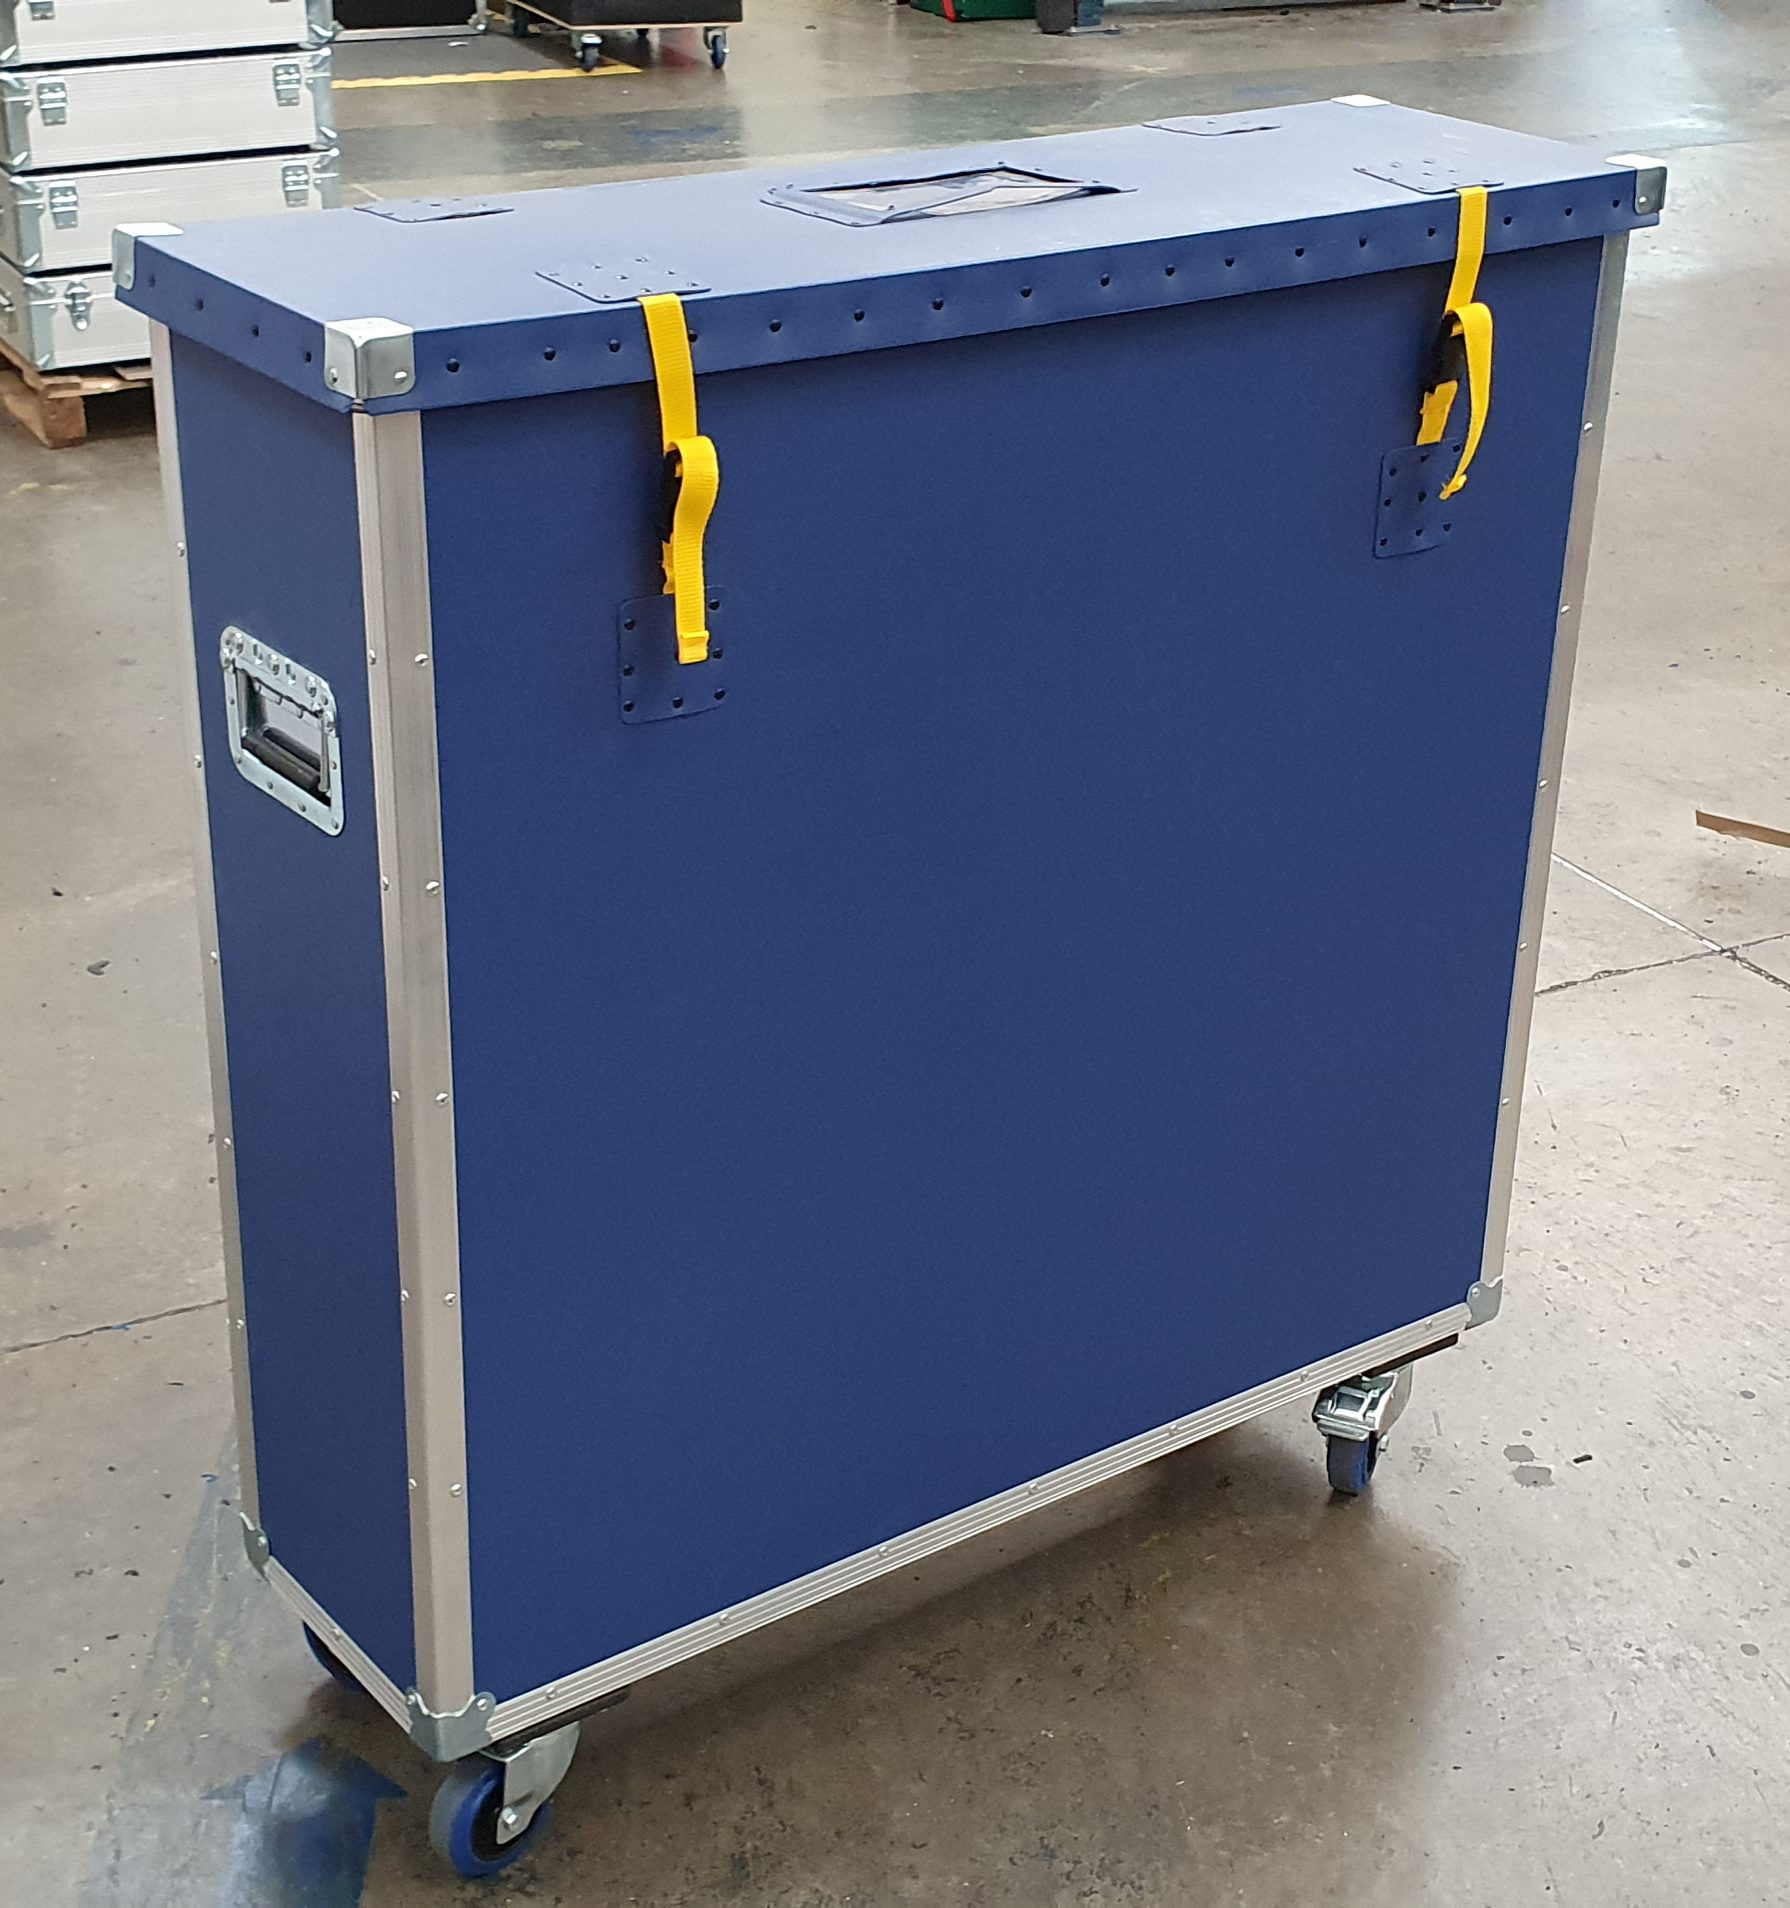 ROADTRUNK POLY/FLIGHT CASE BLUE 1060 X 285 X 1000mm